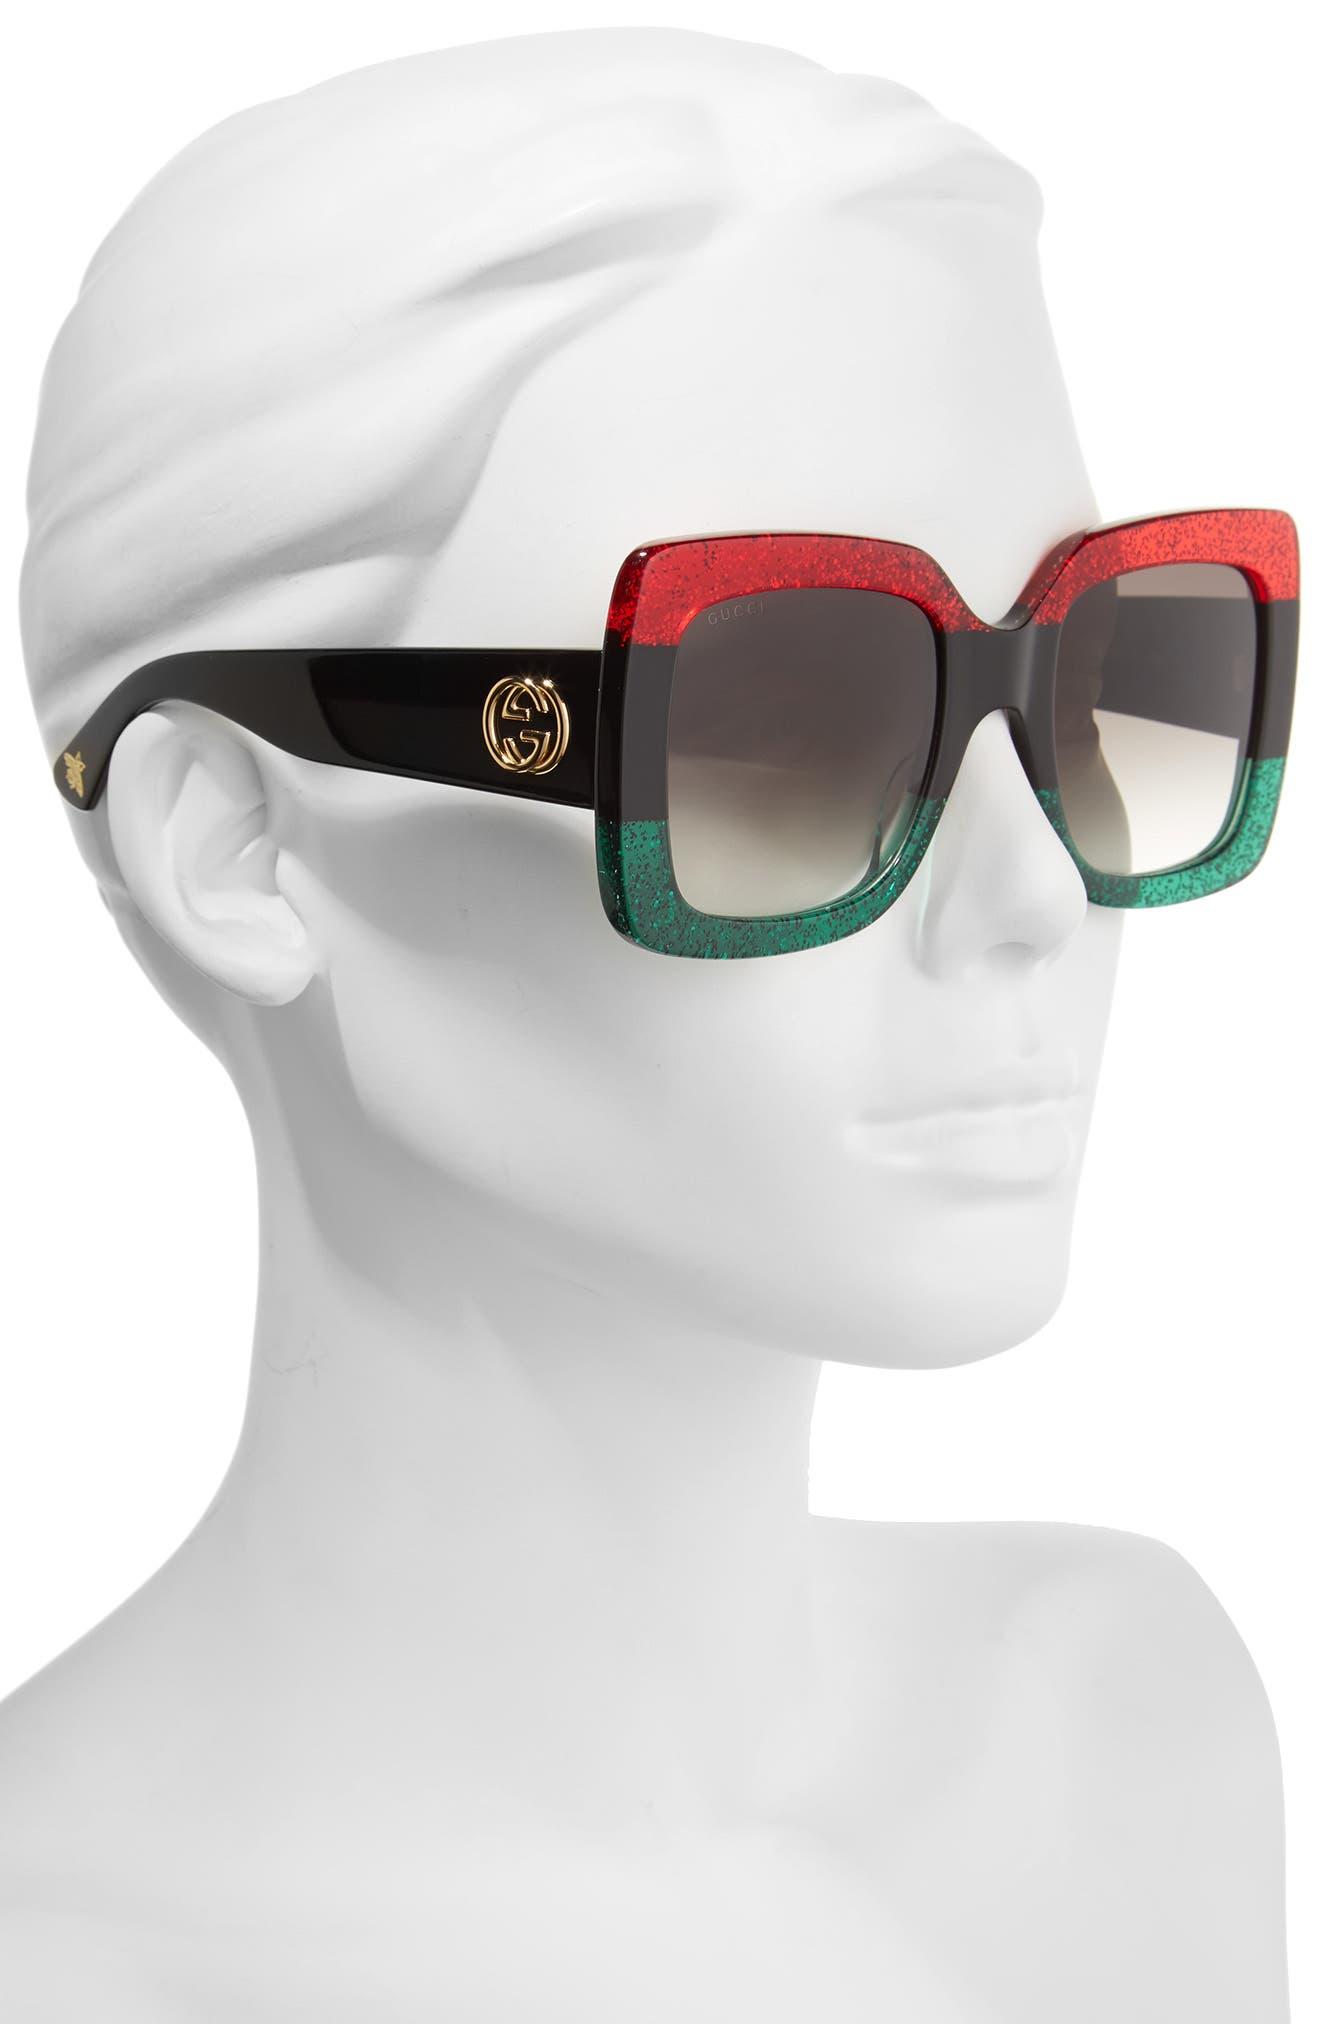 GUCCI, 55mm Square Sunglasses, Alternate thumbnail 2, color, RED BLACK GREEN/ GREY